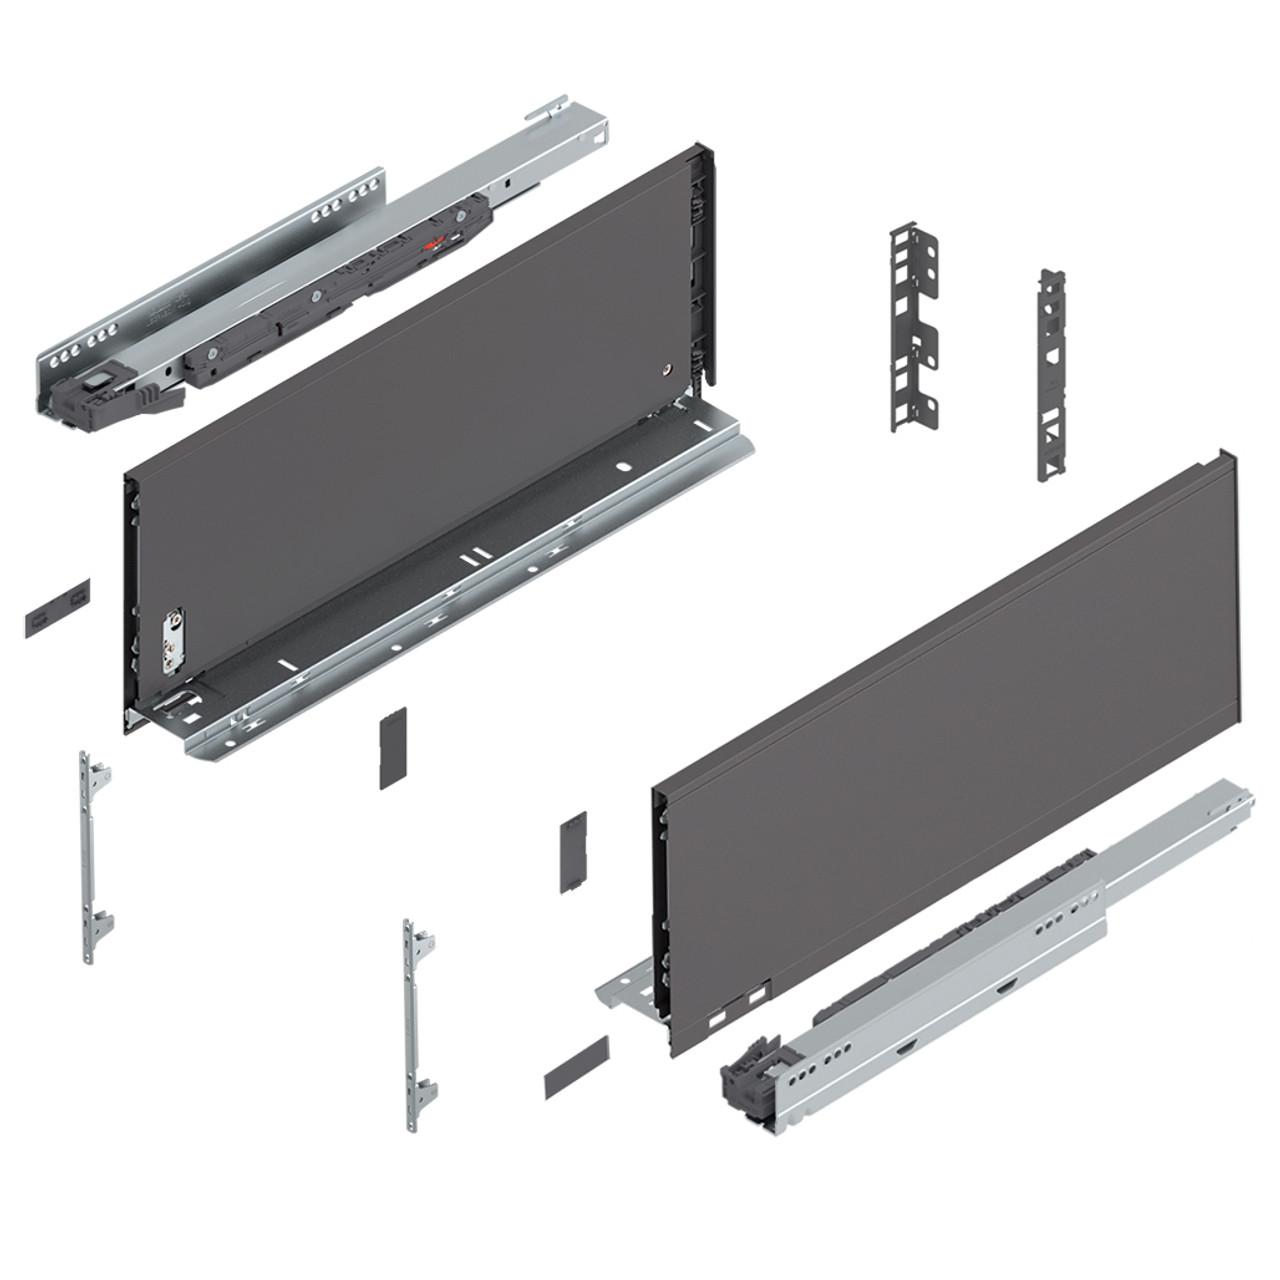 LEGRABOX Component Kit - F Height